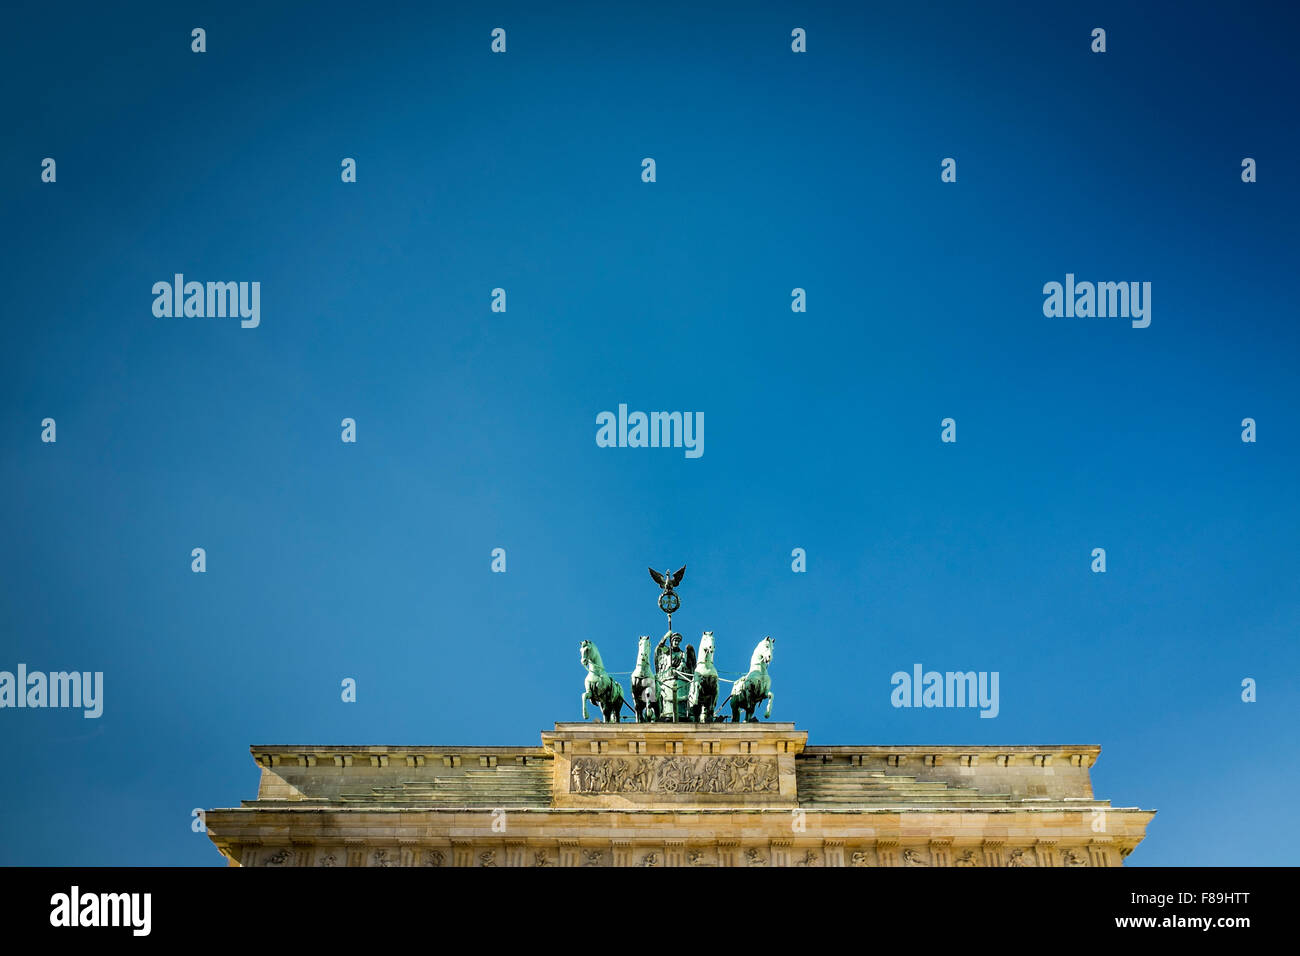 Quadriga on the Brandenburg Gate, Berlin, Germany - Stock Image